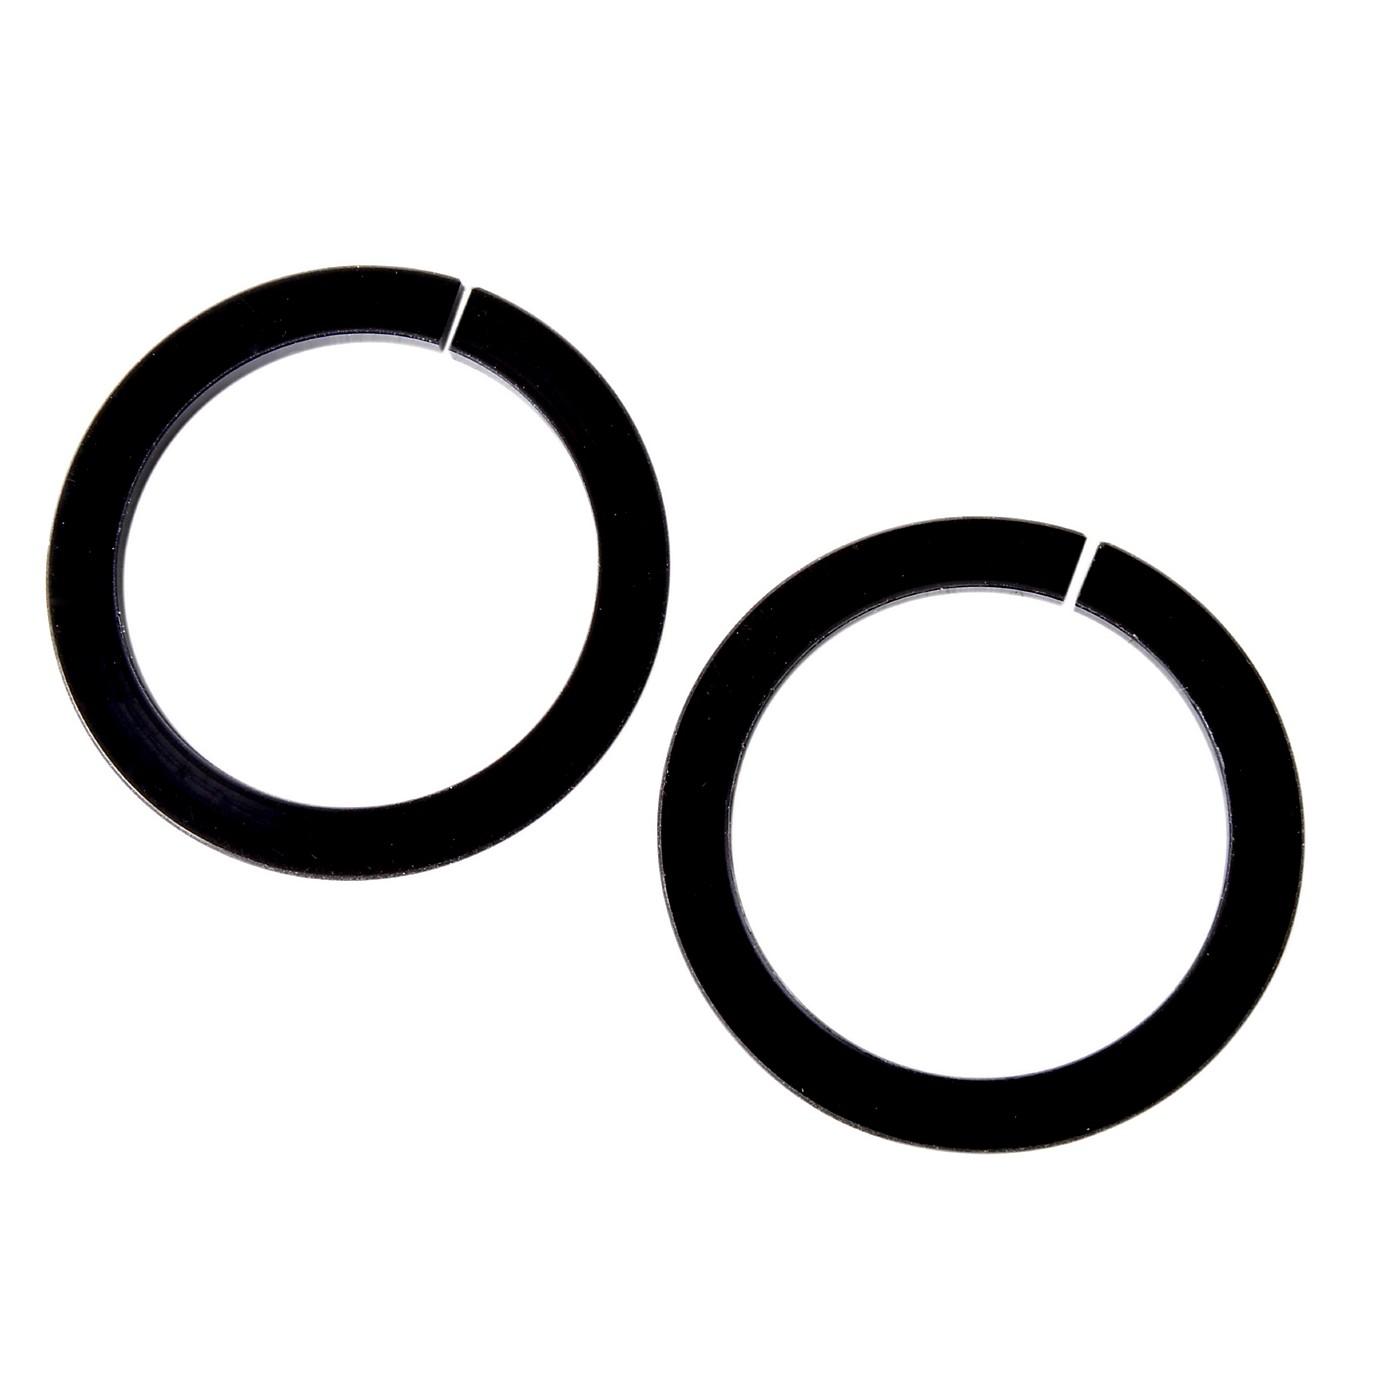 Vandoren Tuning Rings - Masters Mouthpiece, Set of 2 thumbnail